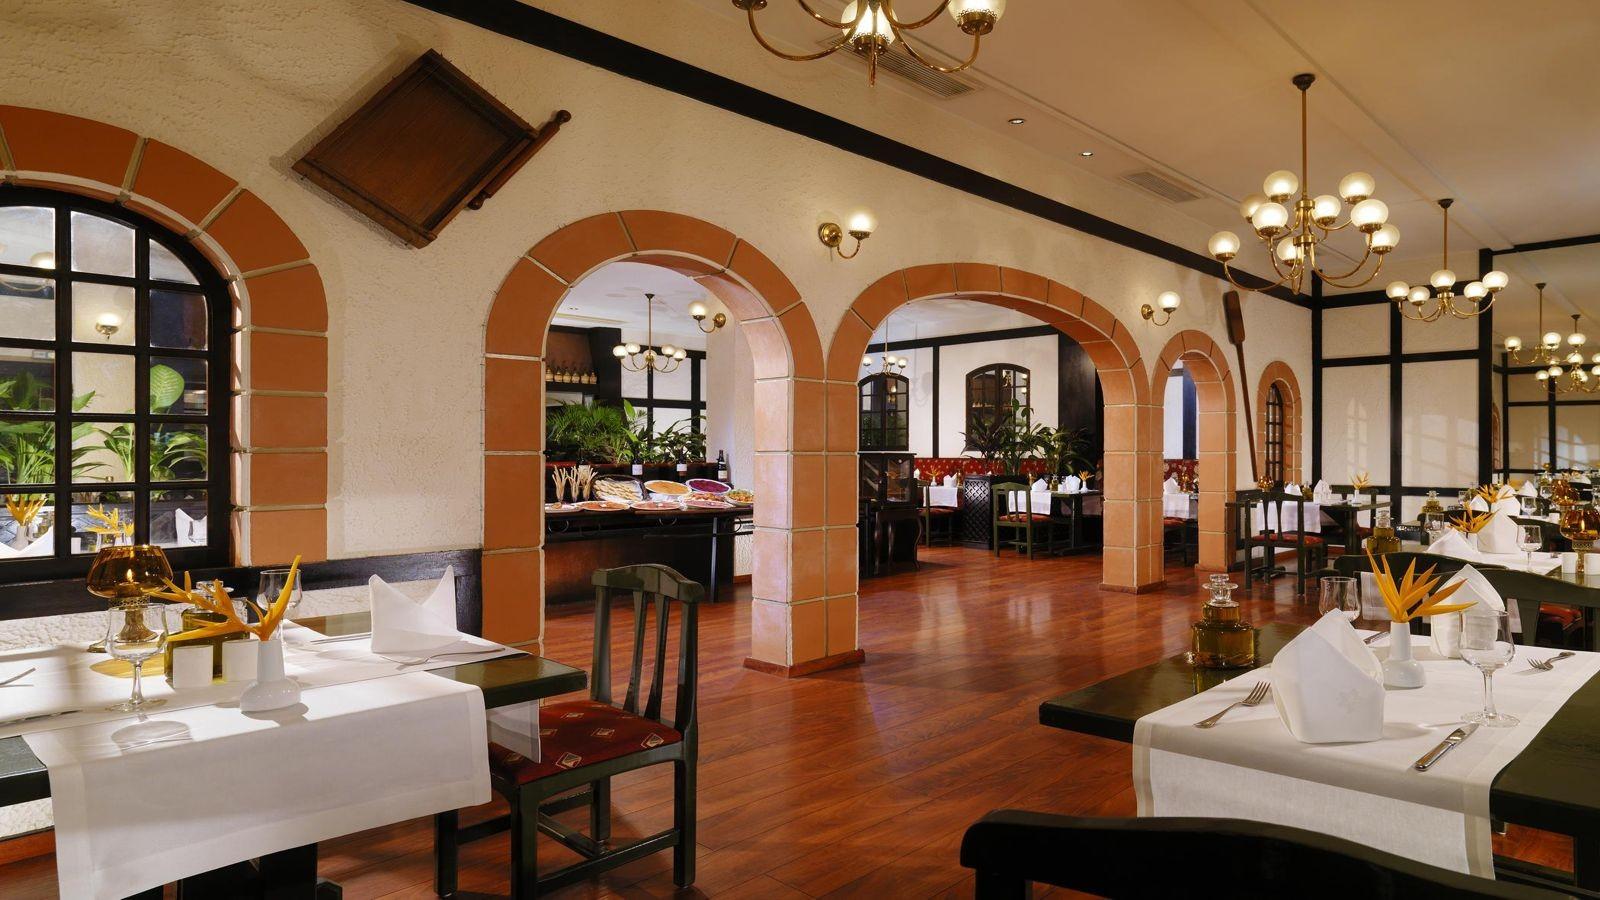 Crockpot Restaurant